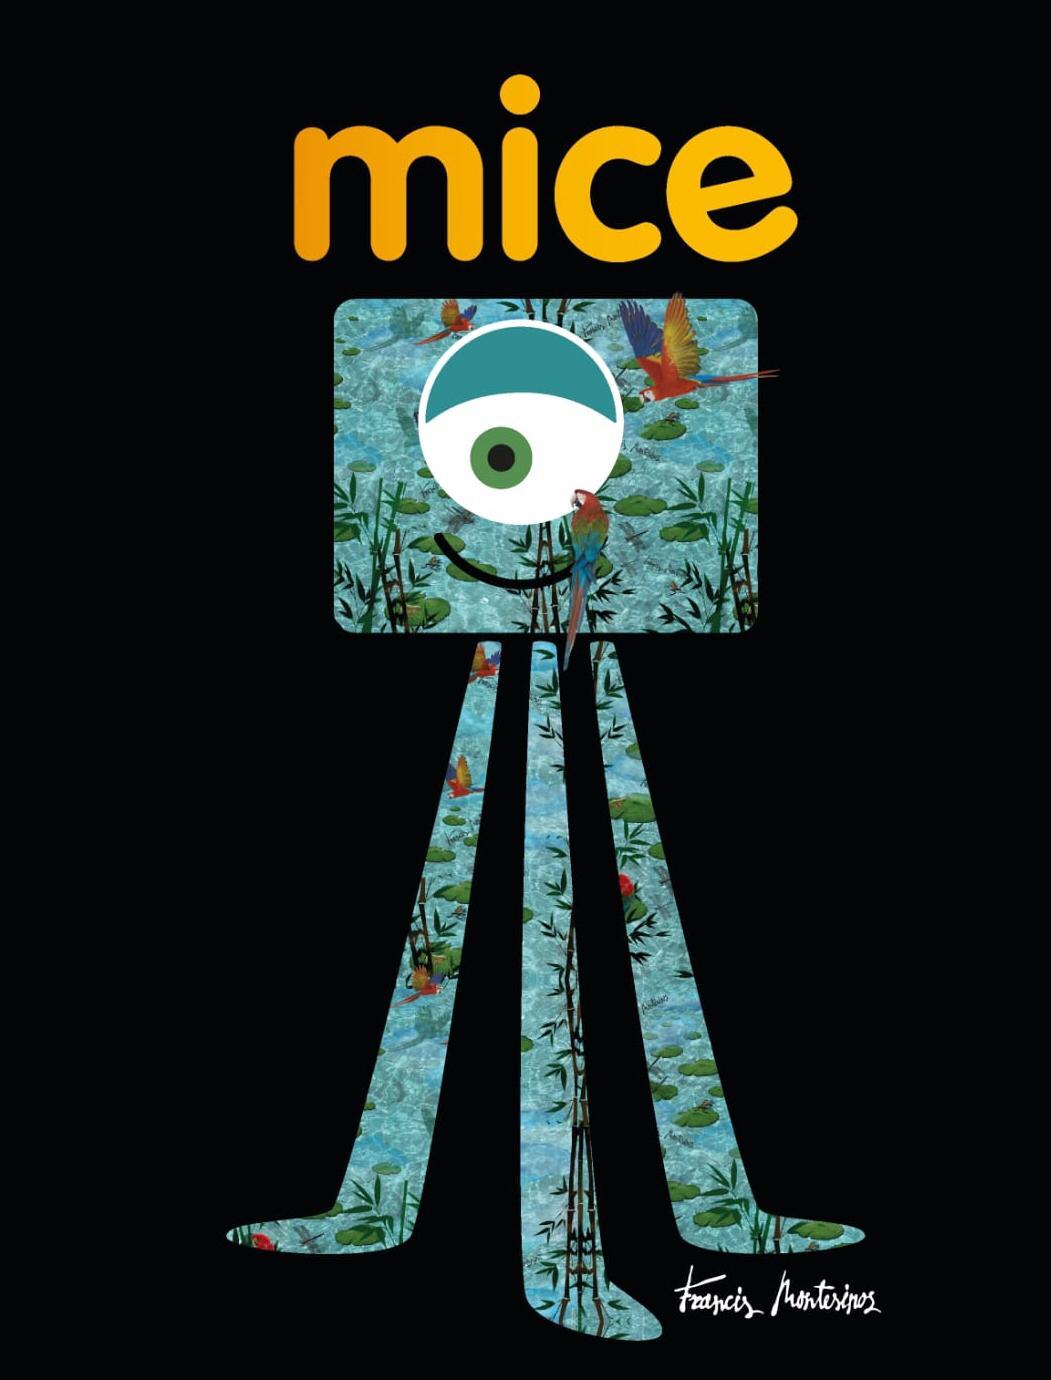 L'Alfàs se estrena como sede en la Mostra Internacional de Cinema Educatiu